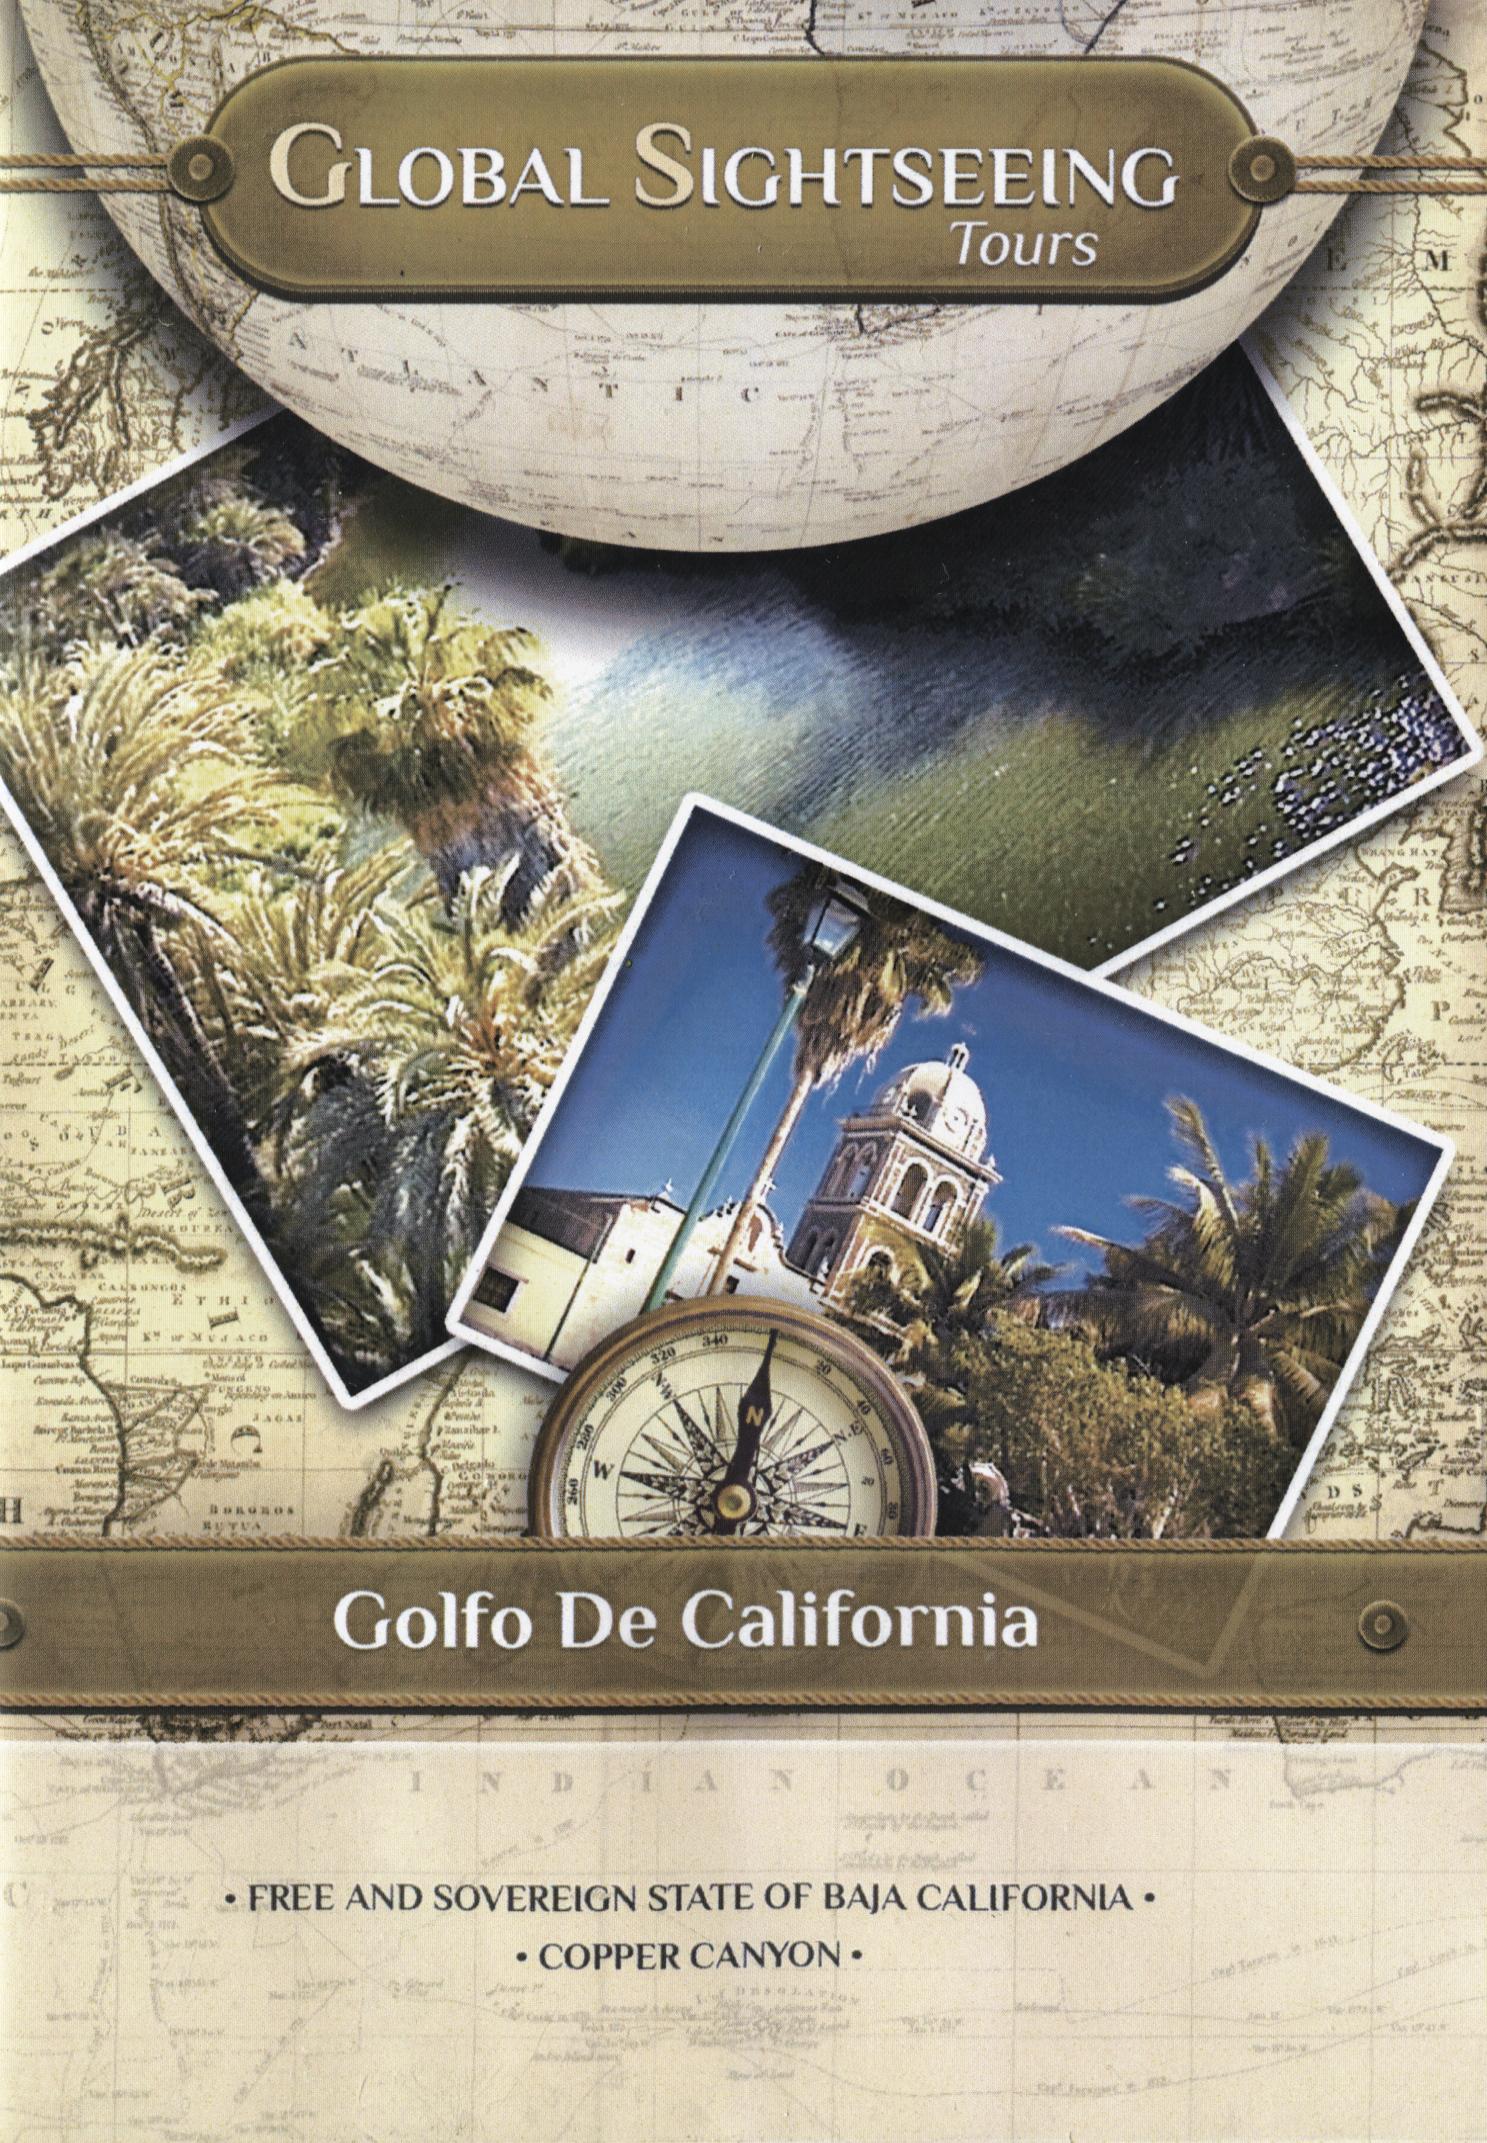 Global Sightseeing Tours: Golfo de California